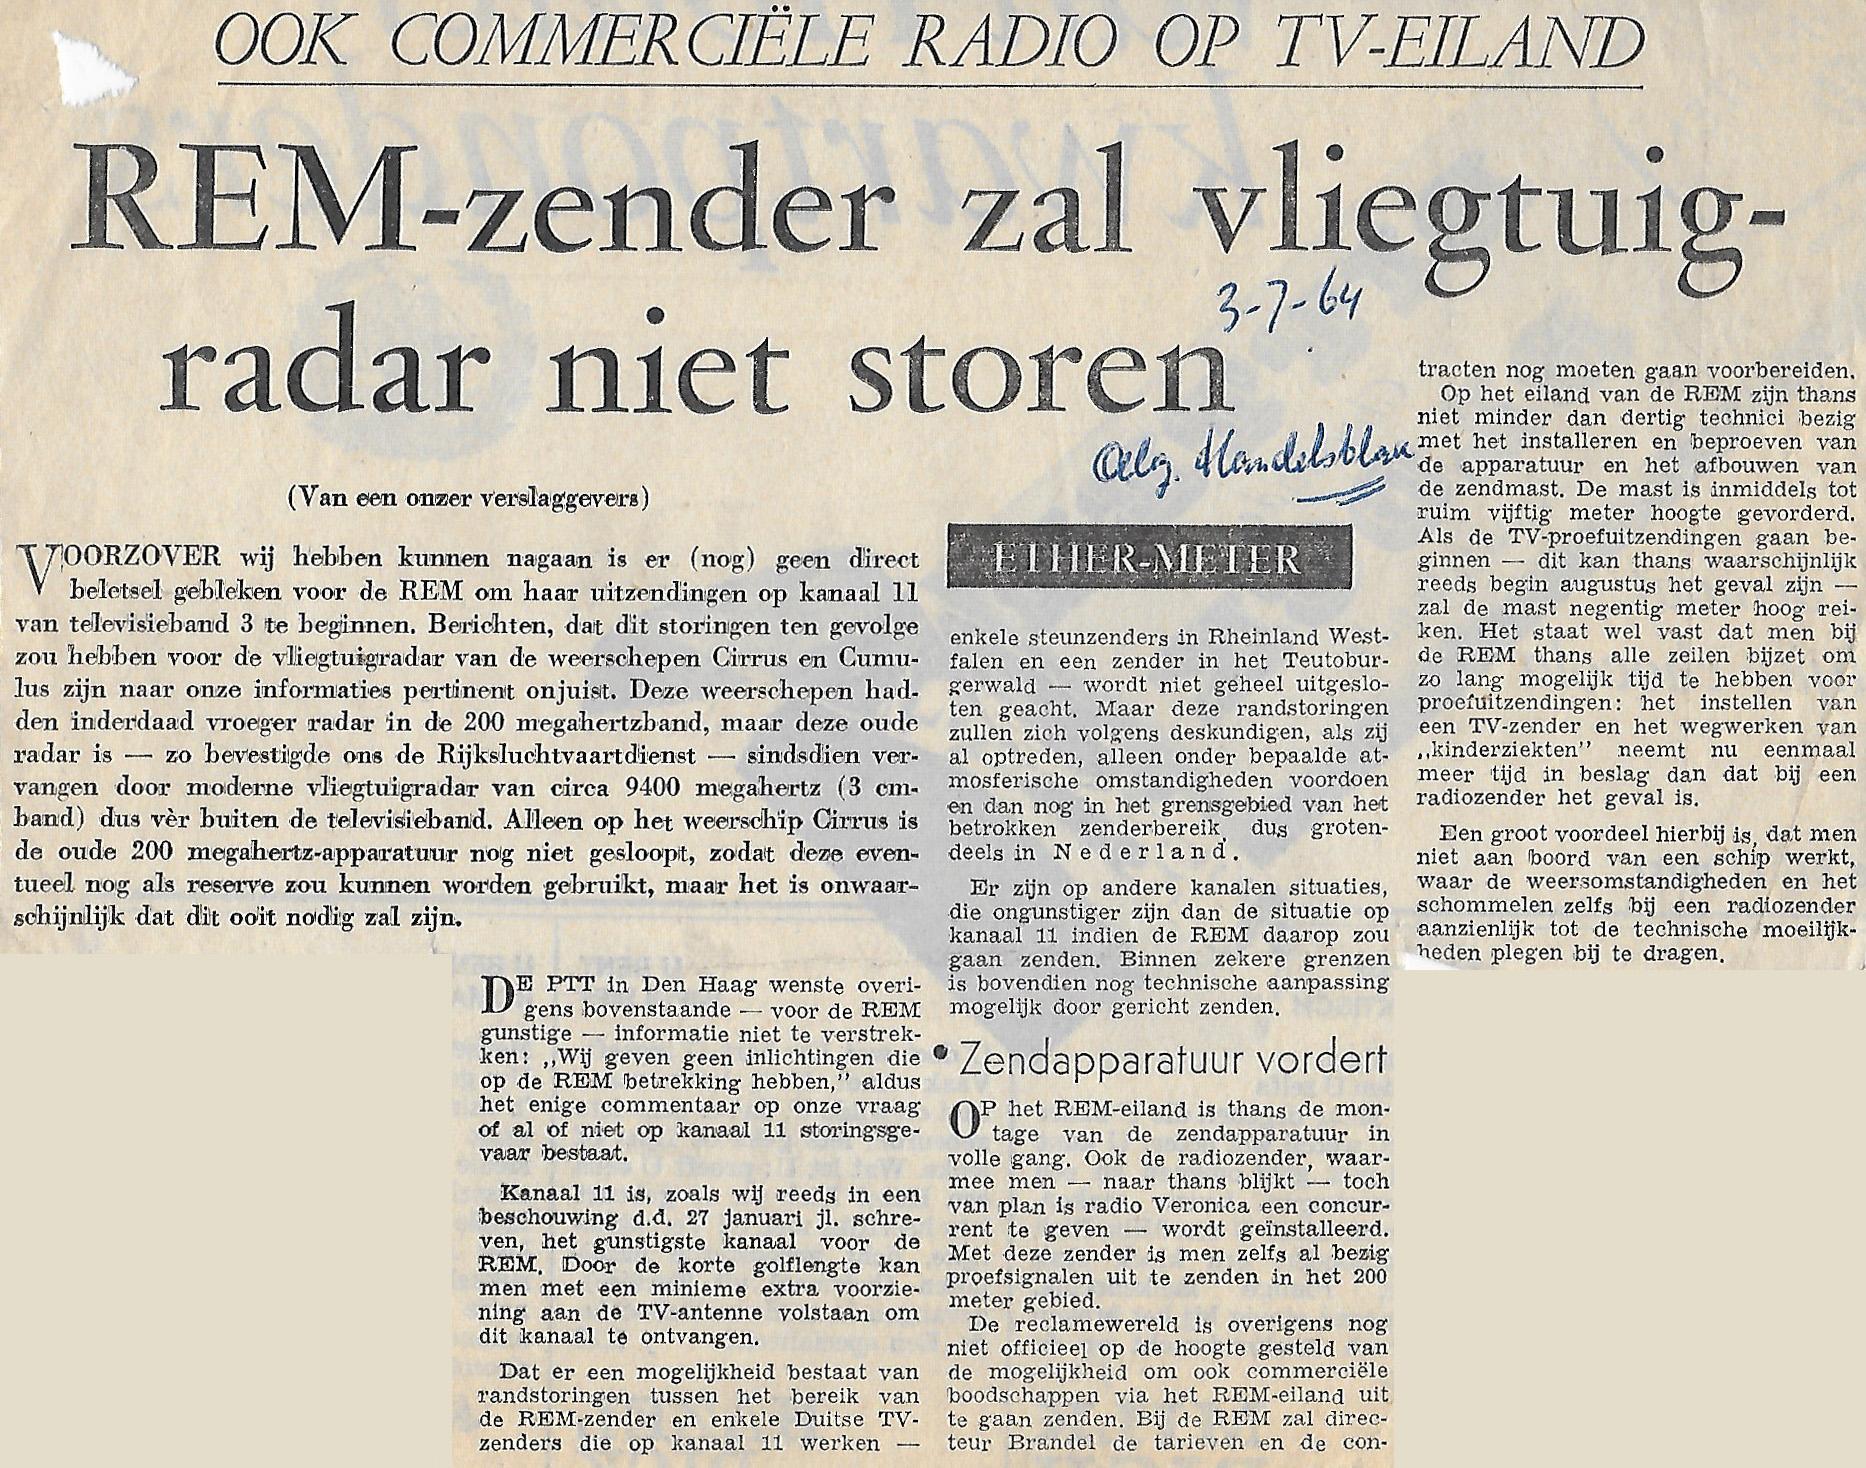 19640703 AH REM zender zal vliegtuiradar niet storen.jpg